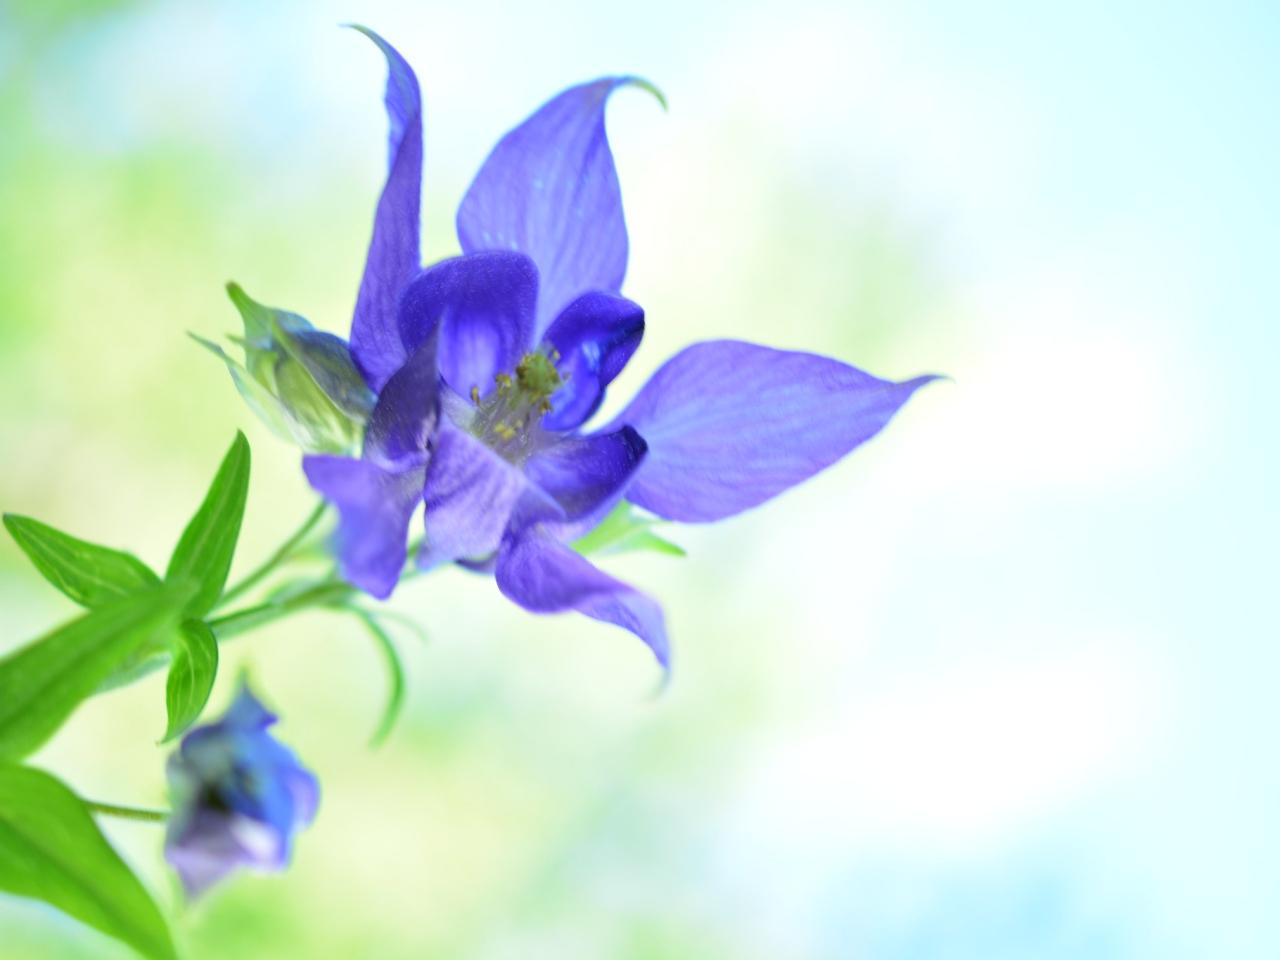 Bella flor azul - 1280x960